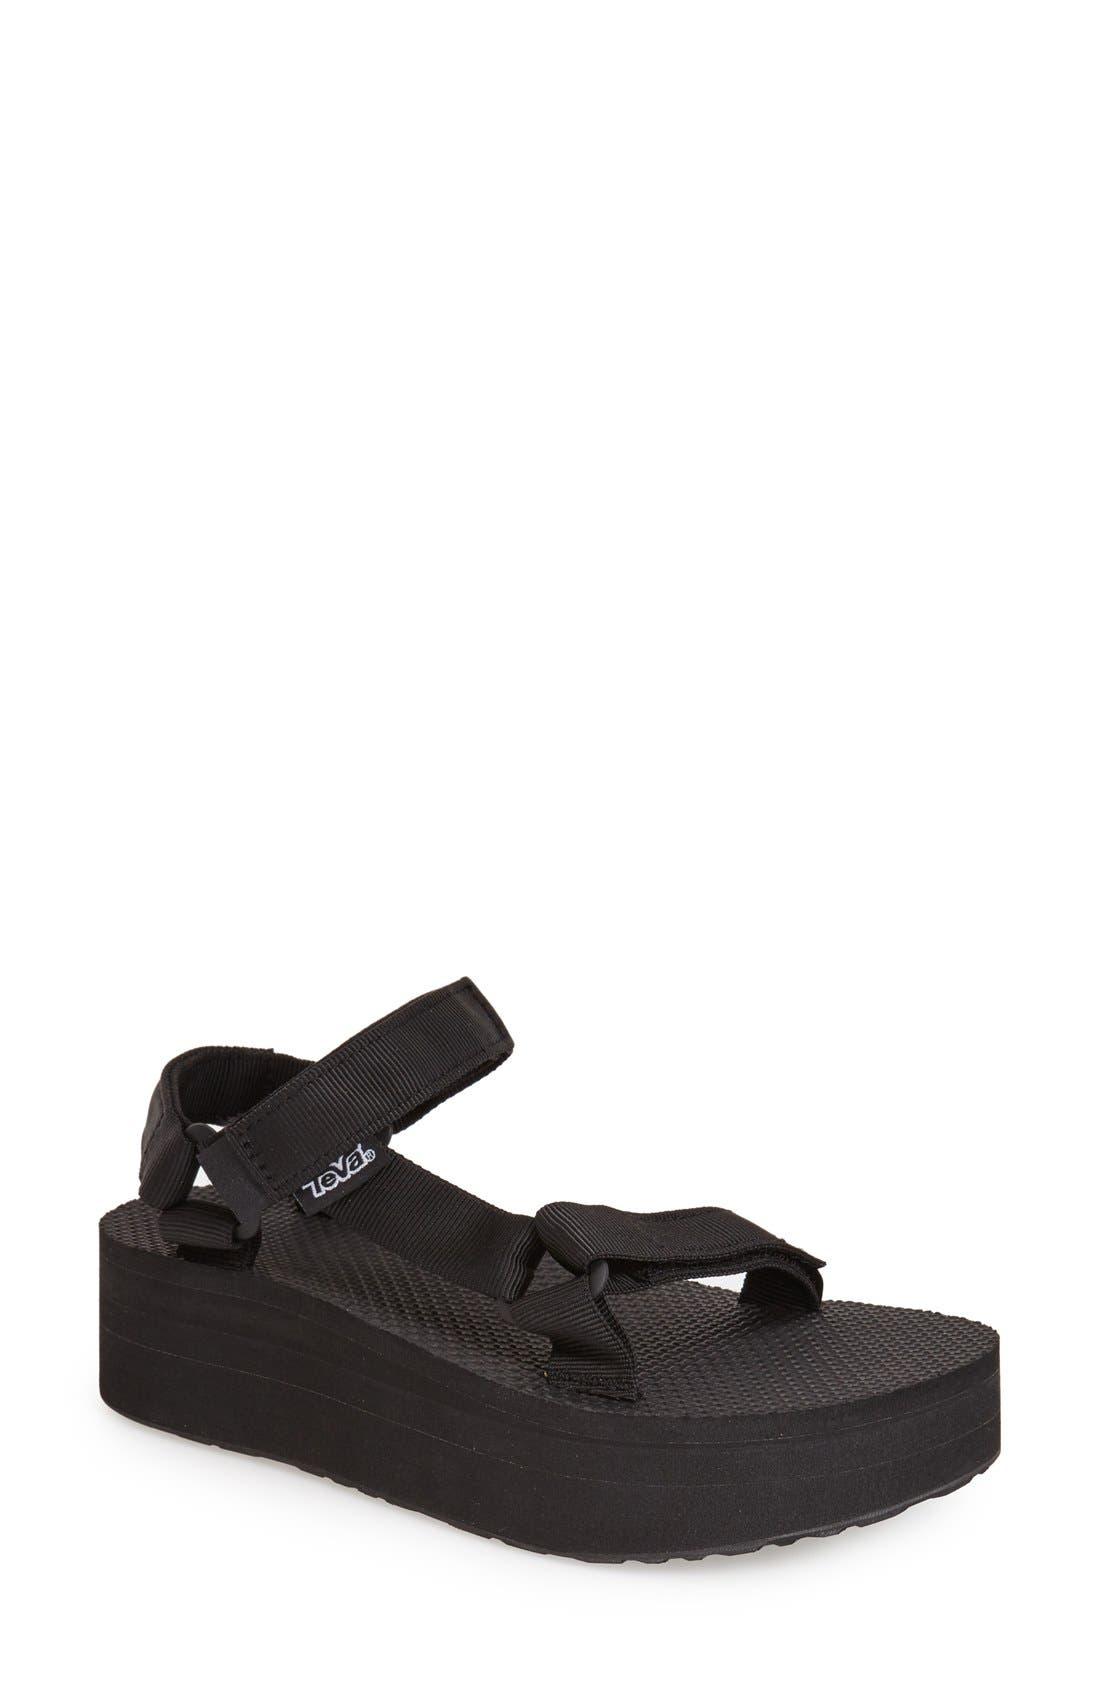 'Universal' Flatform Sandal,                         Main,                         color, 001